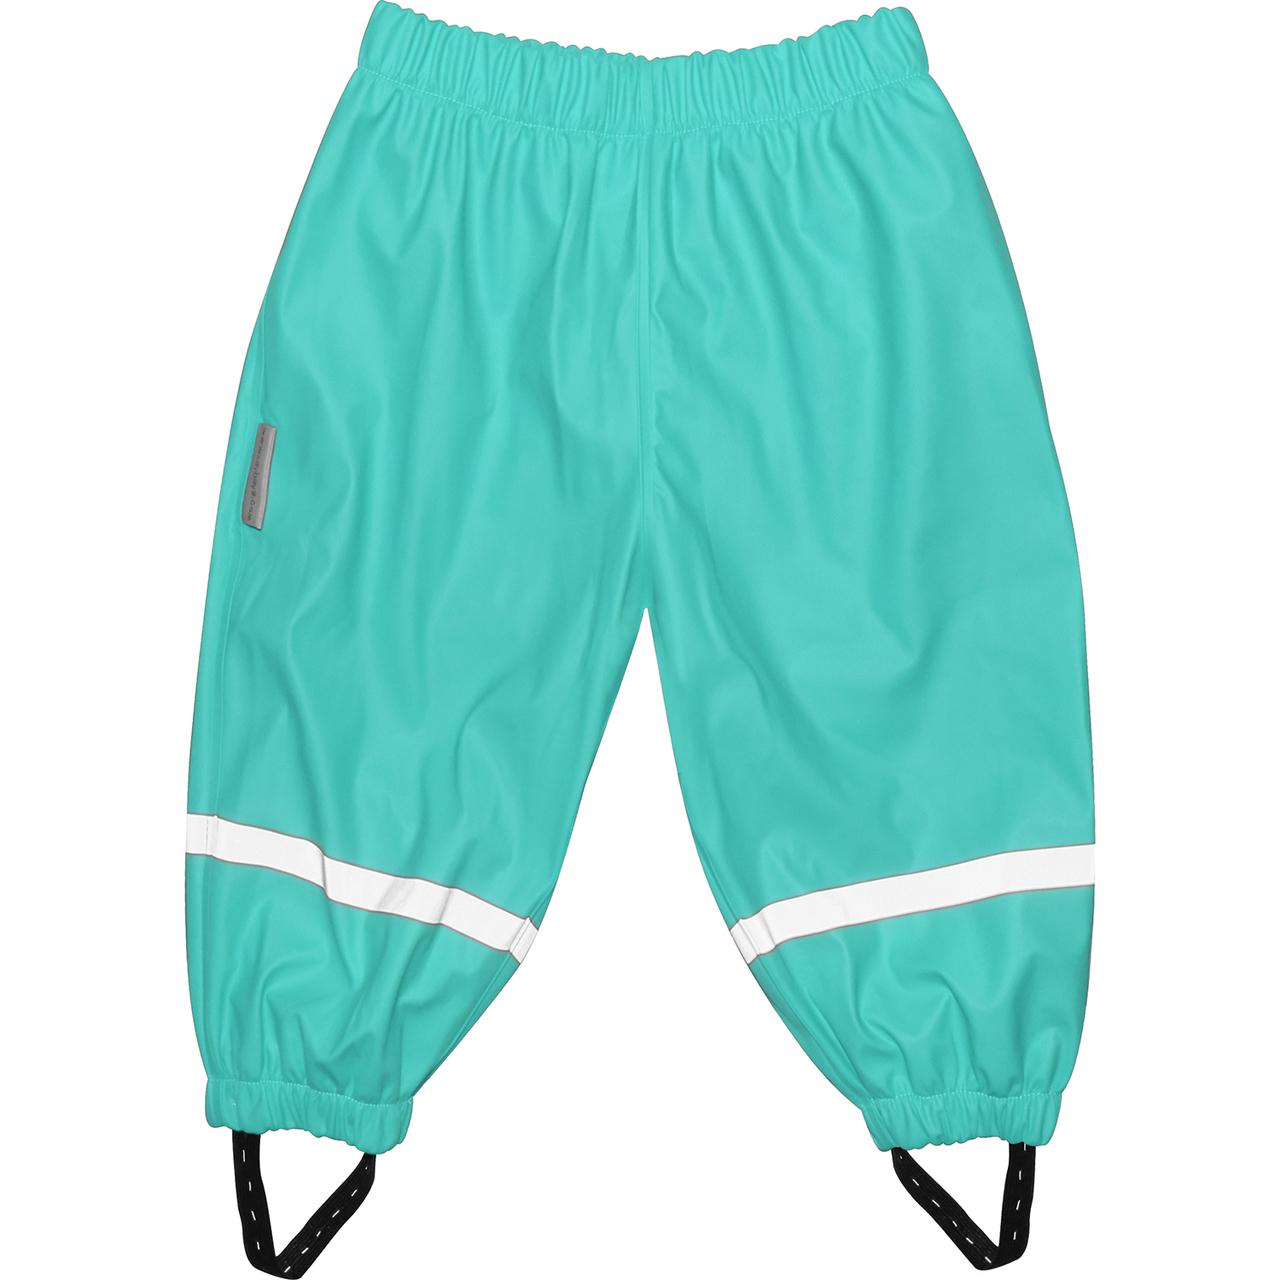 Silly Billyz Waterproof Pants - Aqua (3-4 Yrs) image